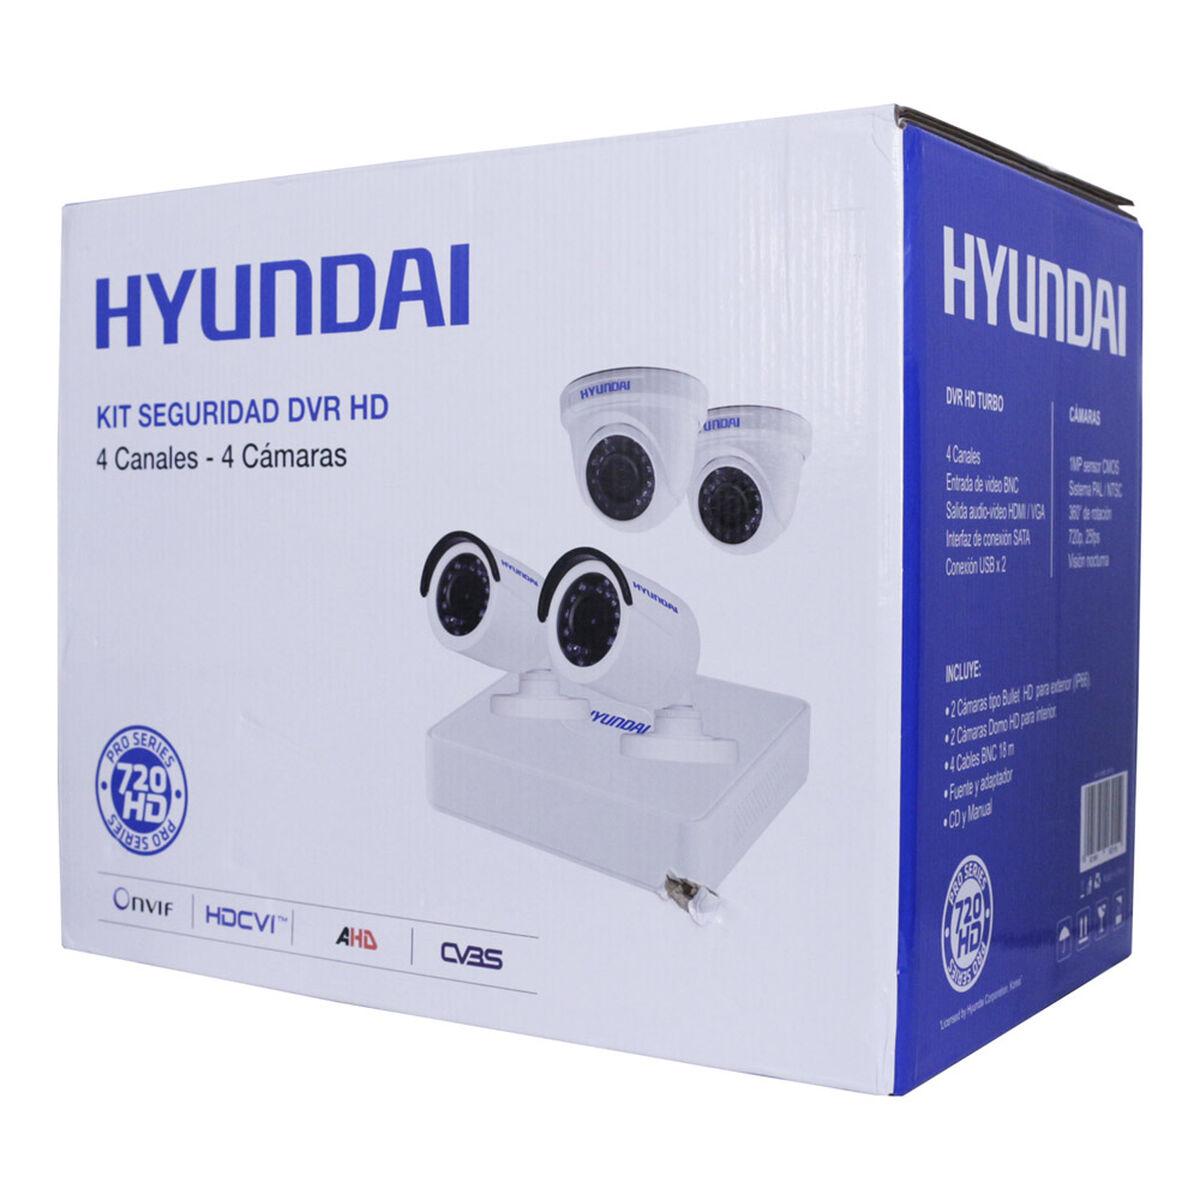 Kit 4 Cámaras de Seguridad Hyundai HY-DVR4CH DVR HD